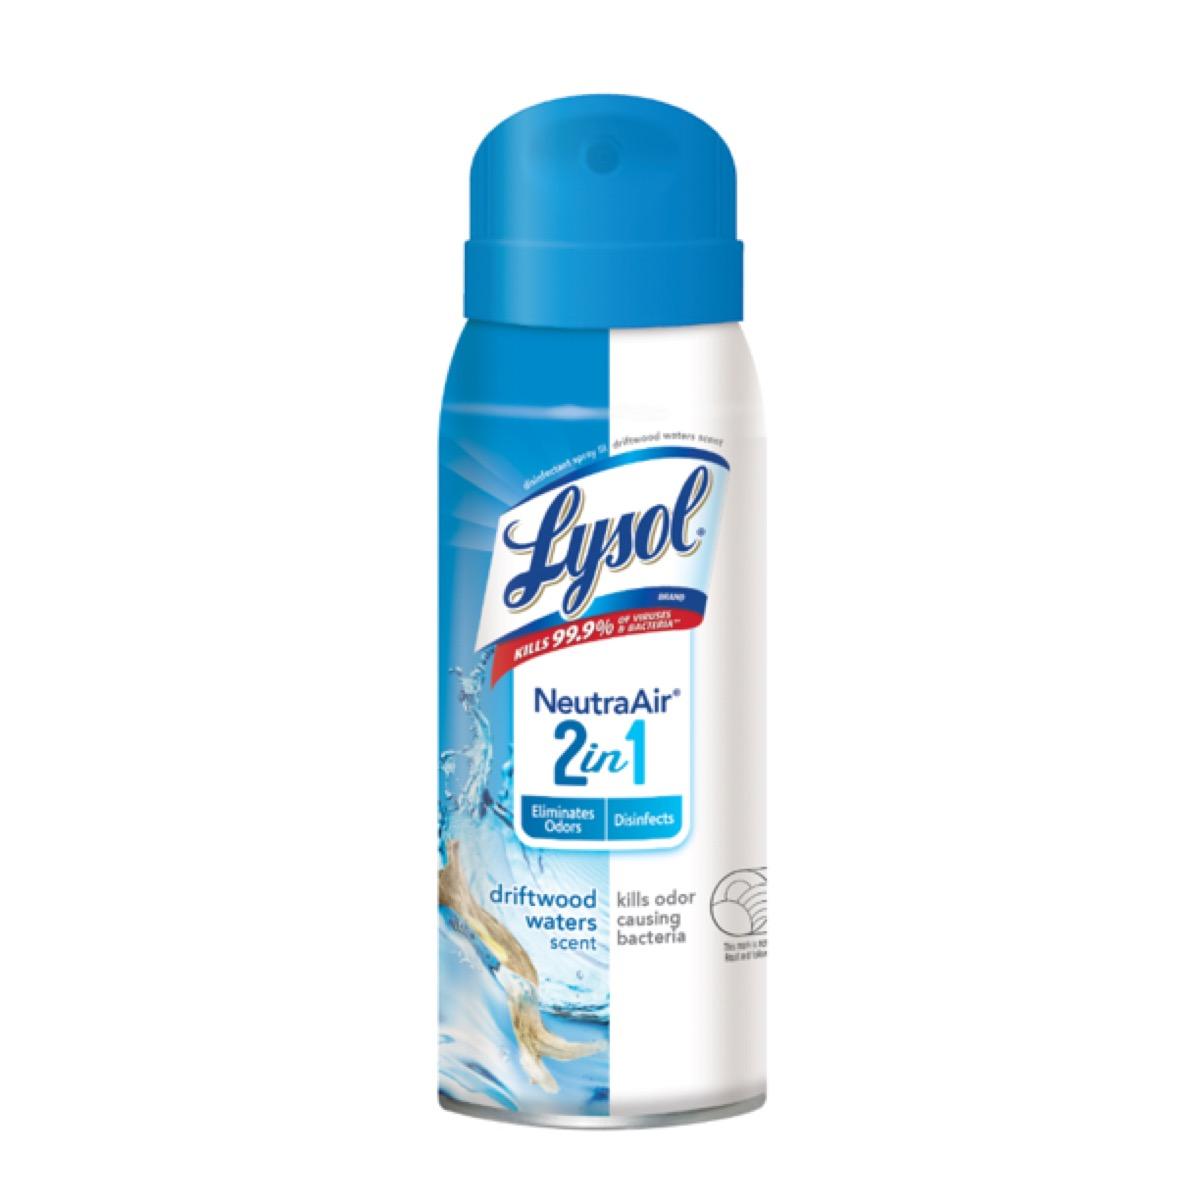 Lysol Neutra Air® 2 in 1